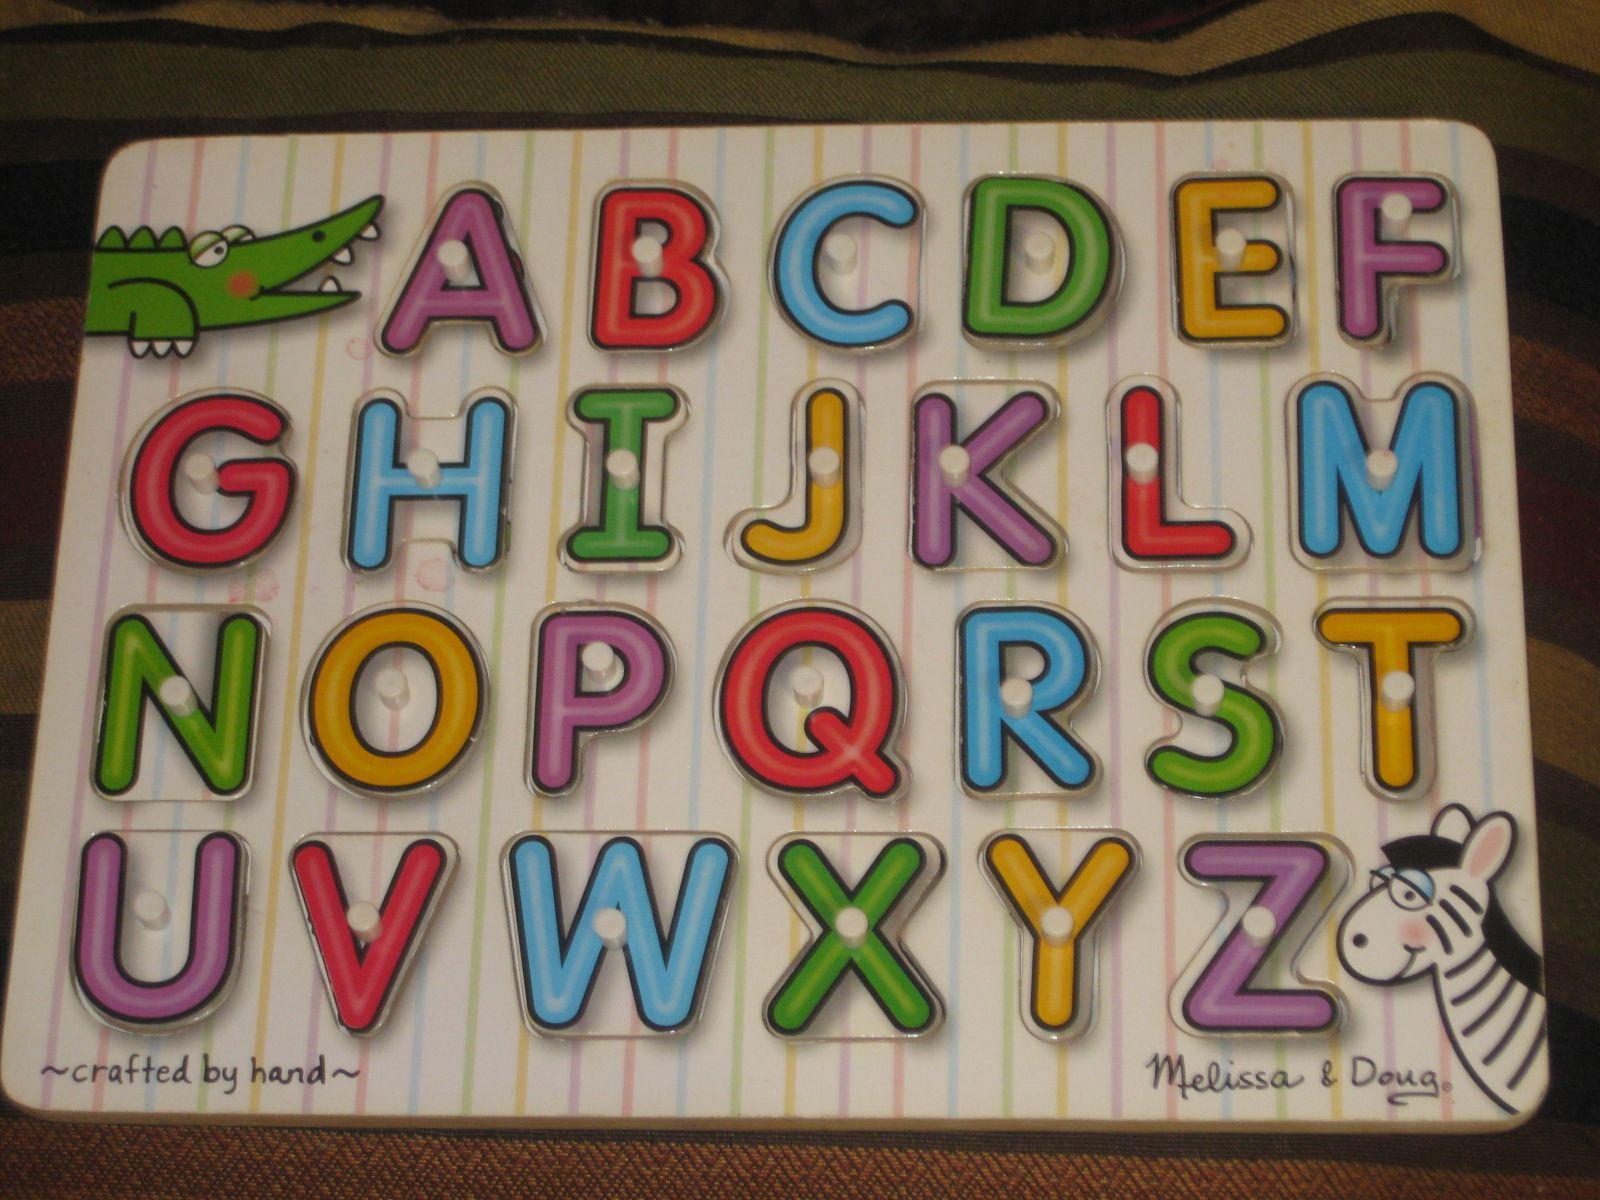 Melissa and Dough Wooden Puzzle Pieces Educational Alphabet Games